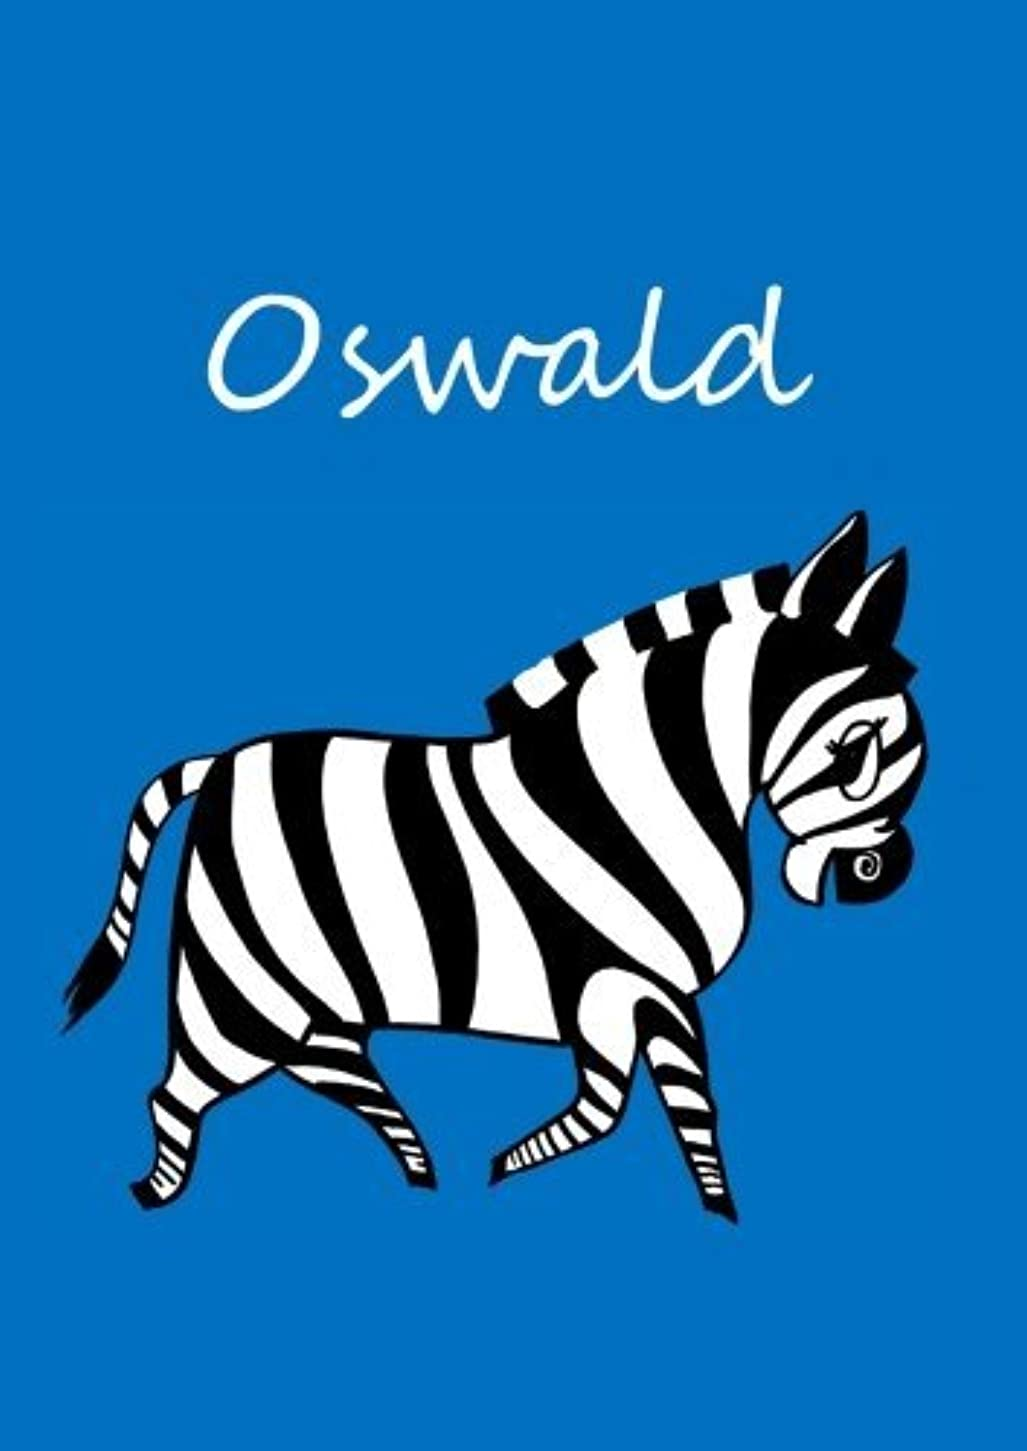 フレア演劇支配的Oswald: individualisiertes Malbuch / Notizbuch / Tagebuch - Zebra - A4 - blanko